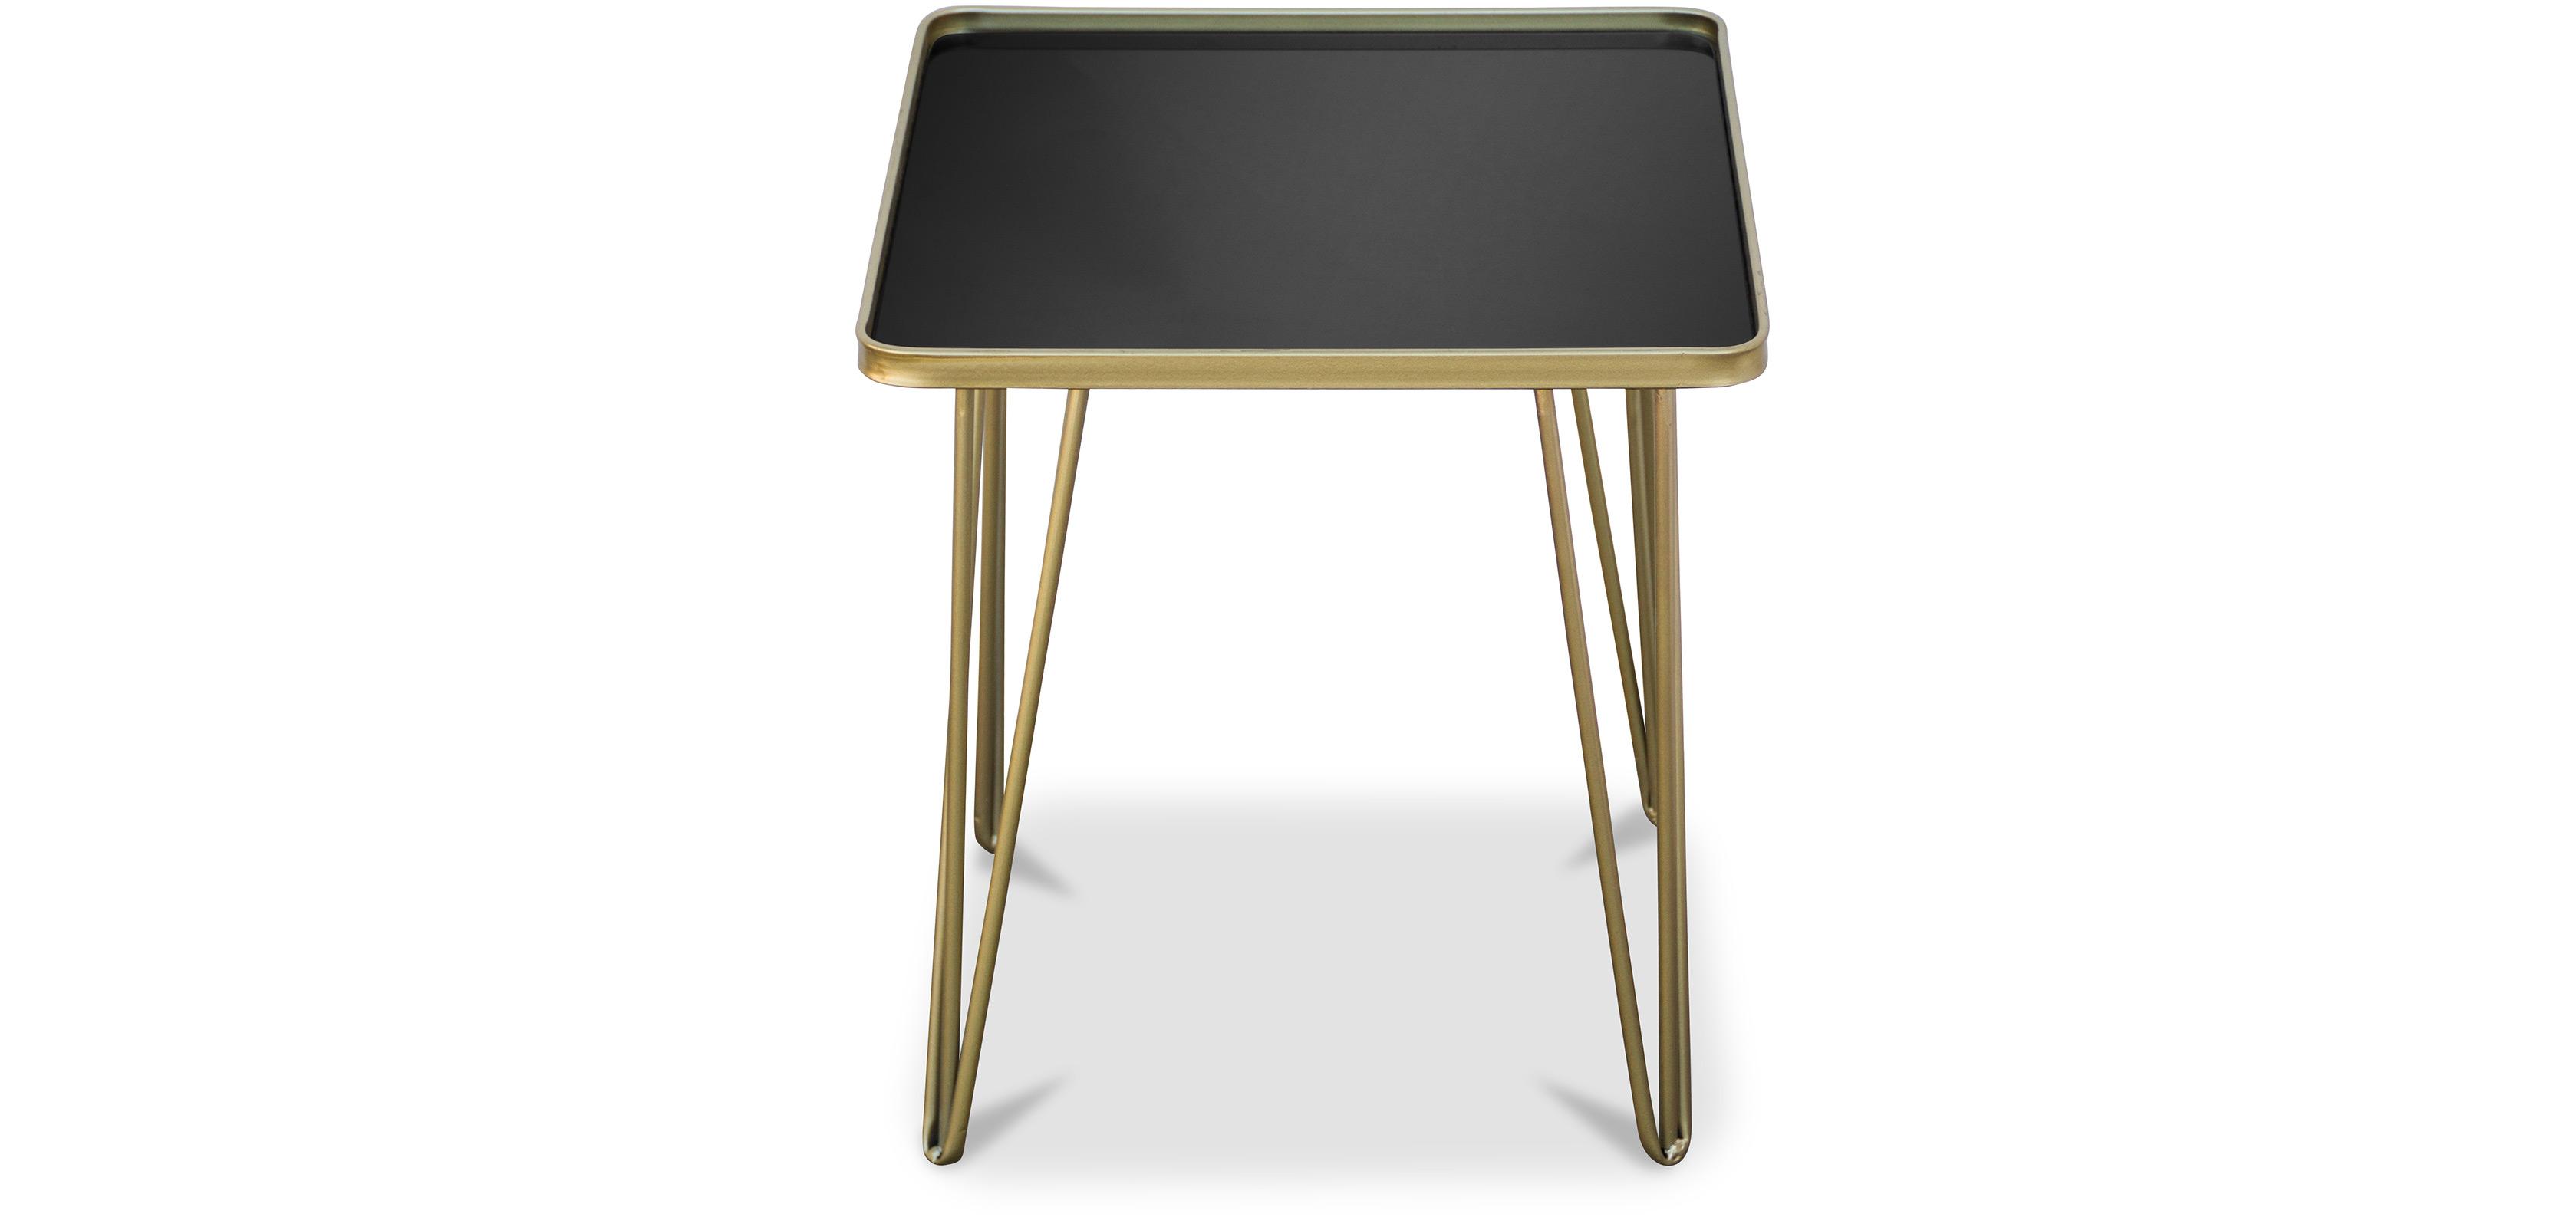 table basse d 39 appoint pieds en pingle dor s. Black Bedroom Furniture Sets. Home Design Ideas